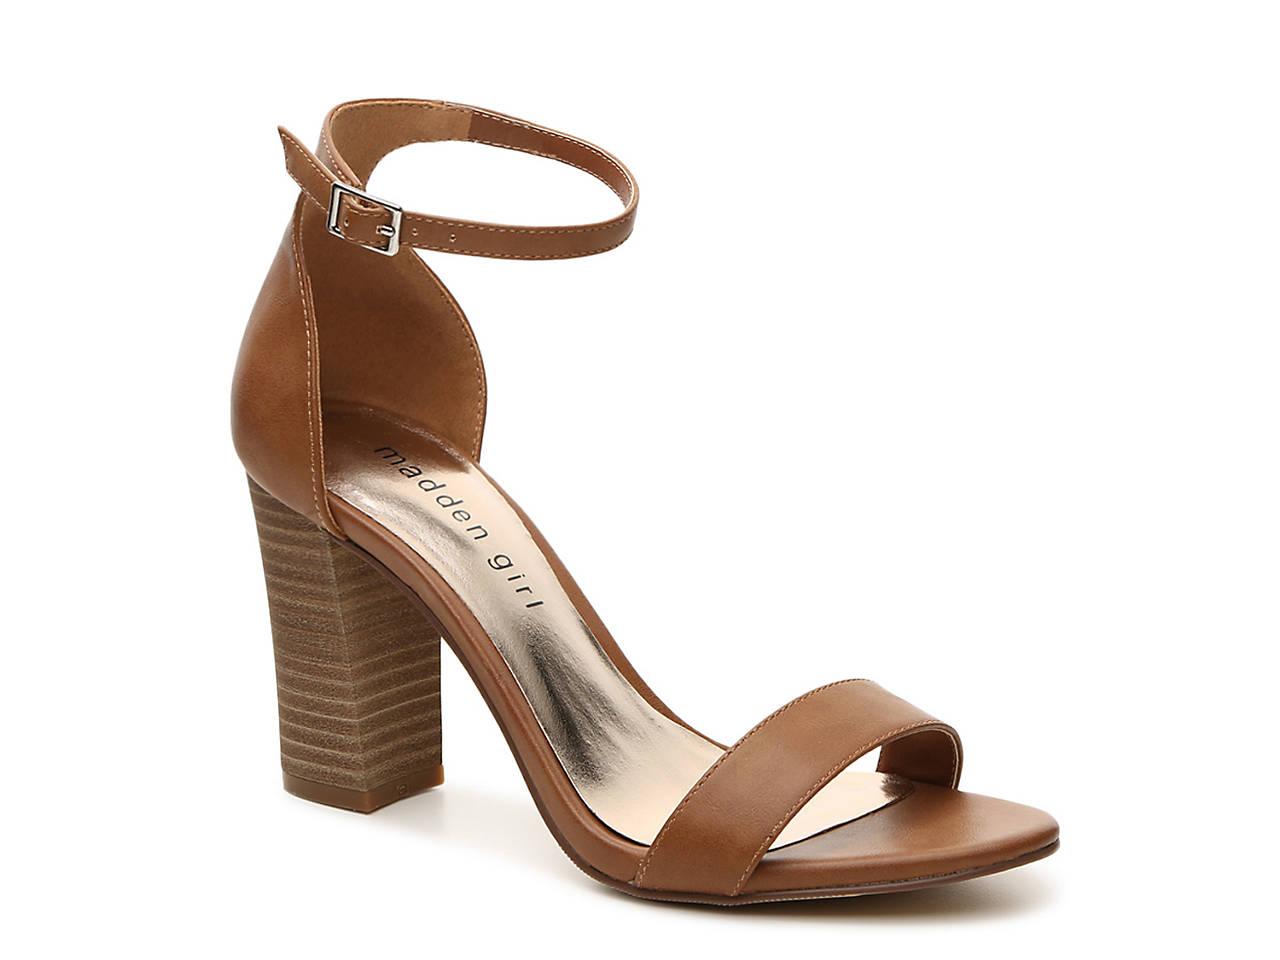 Bella sandals Pictures For Sale Outlet Excellent dEhvTbs